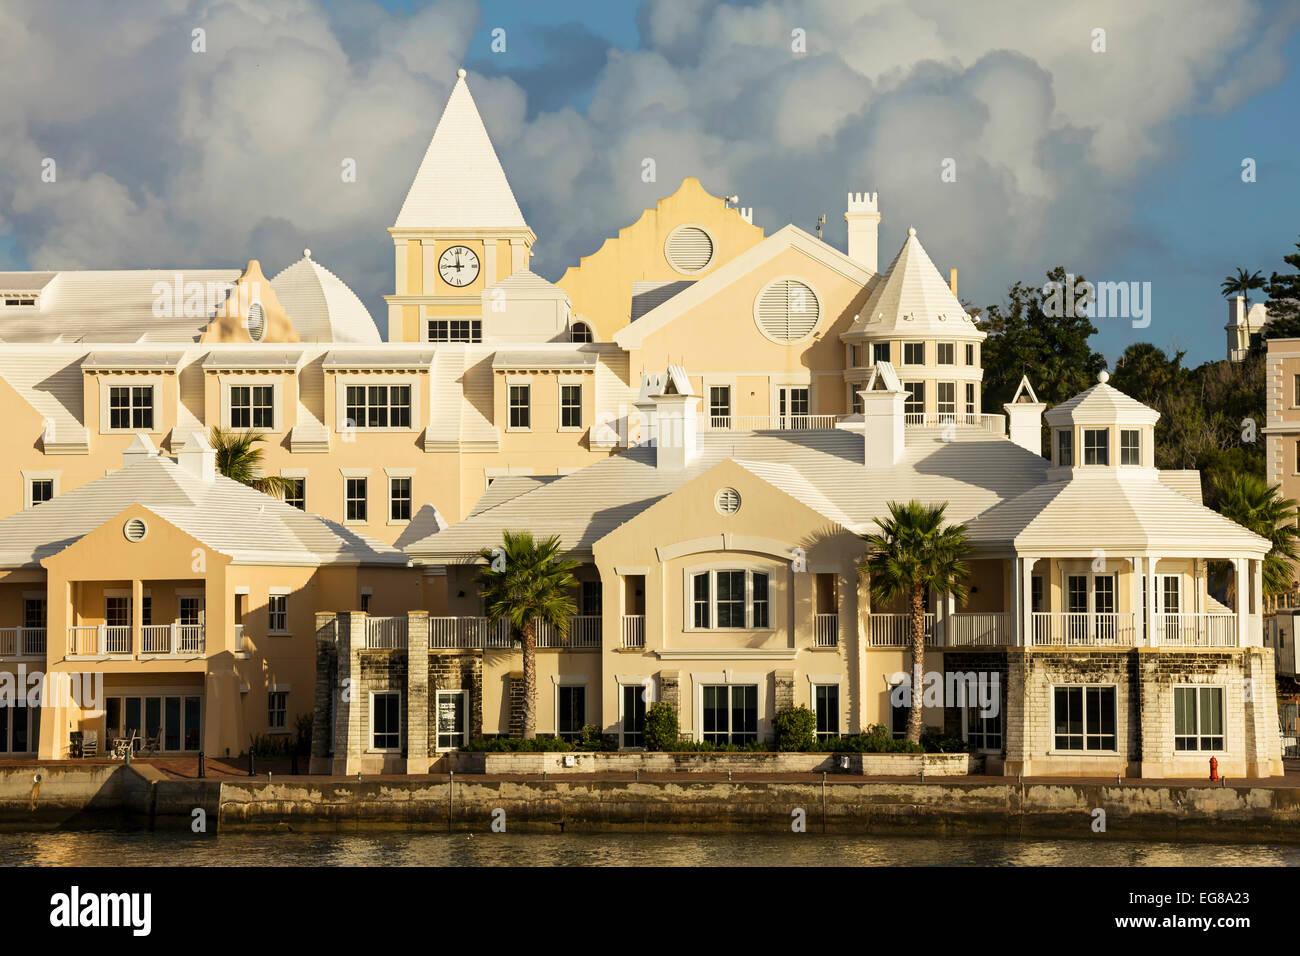 Condo development along the shores of Hamilton Harbour, Bermuda. - Stock Image